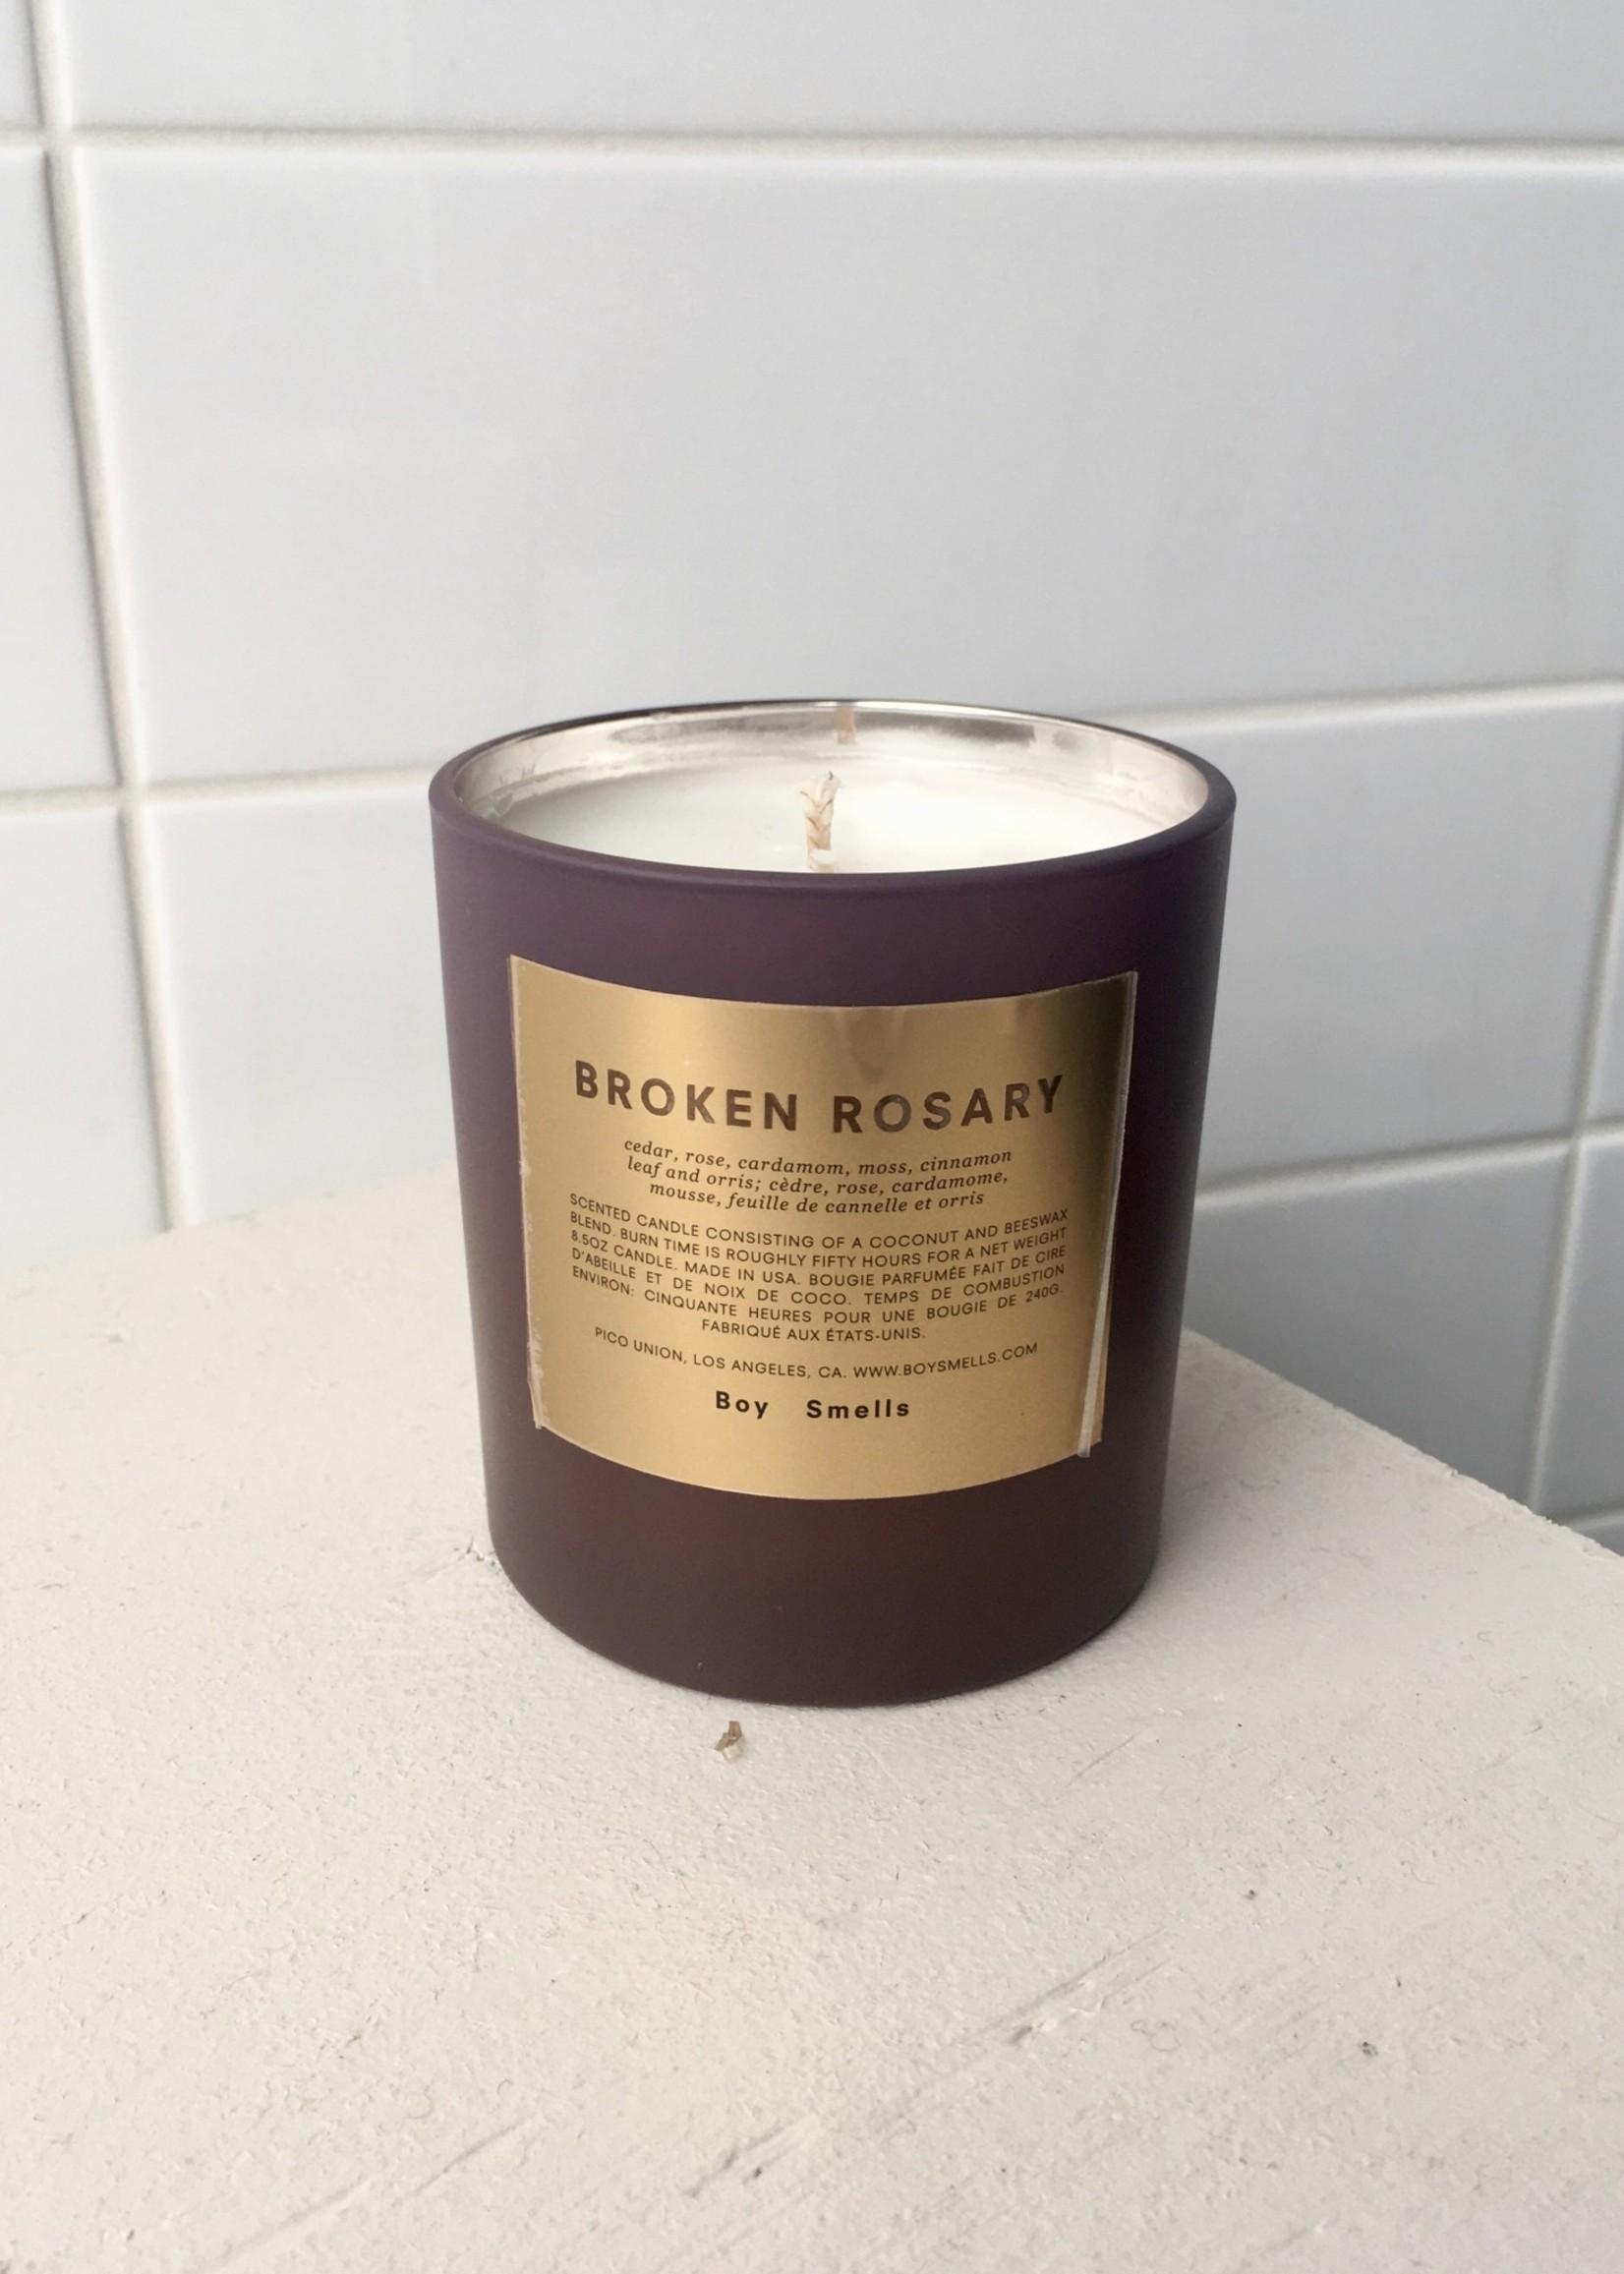 Boy Smells Rituals Candles